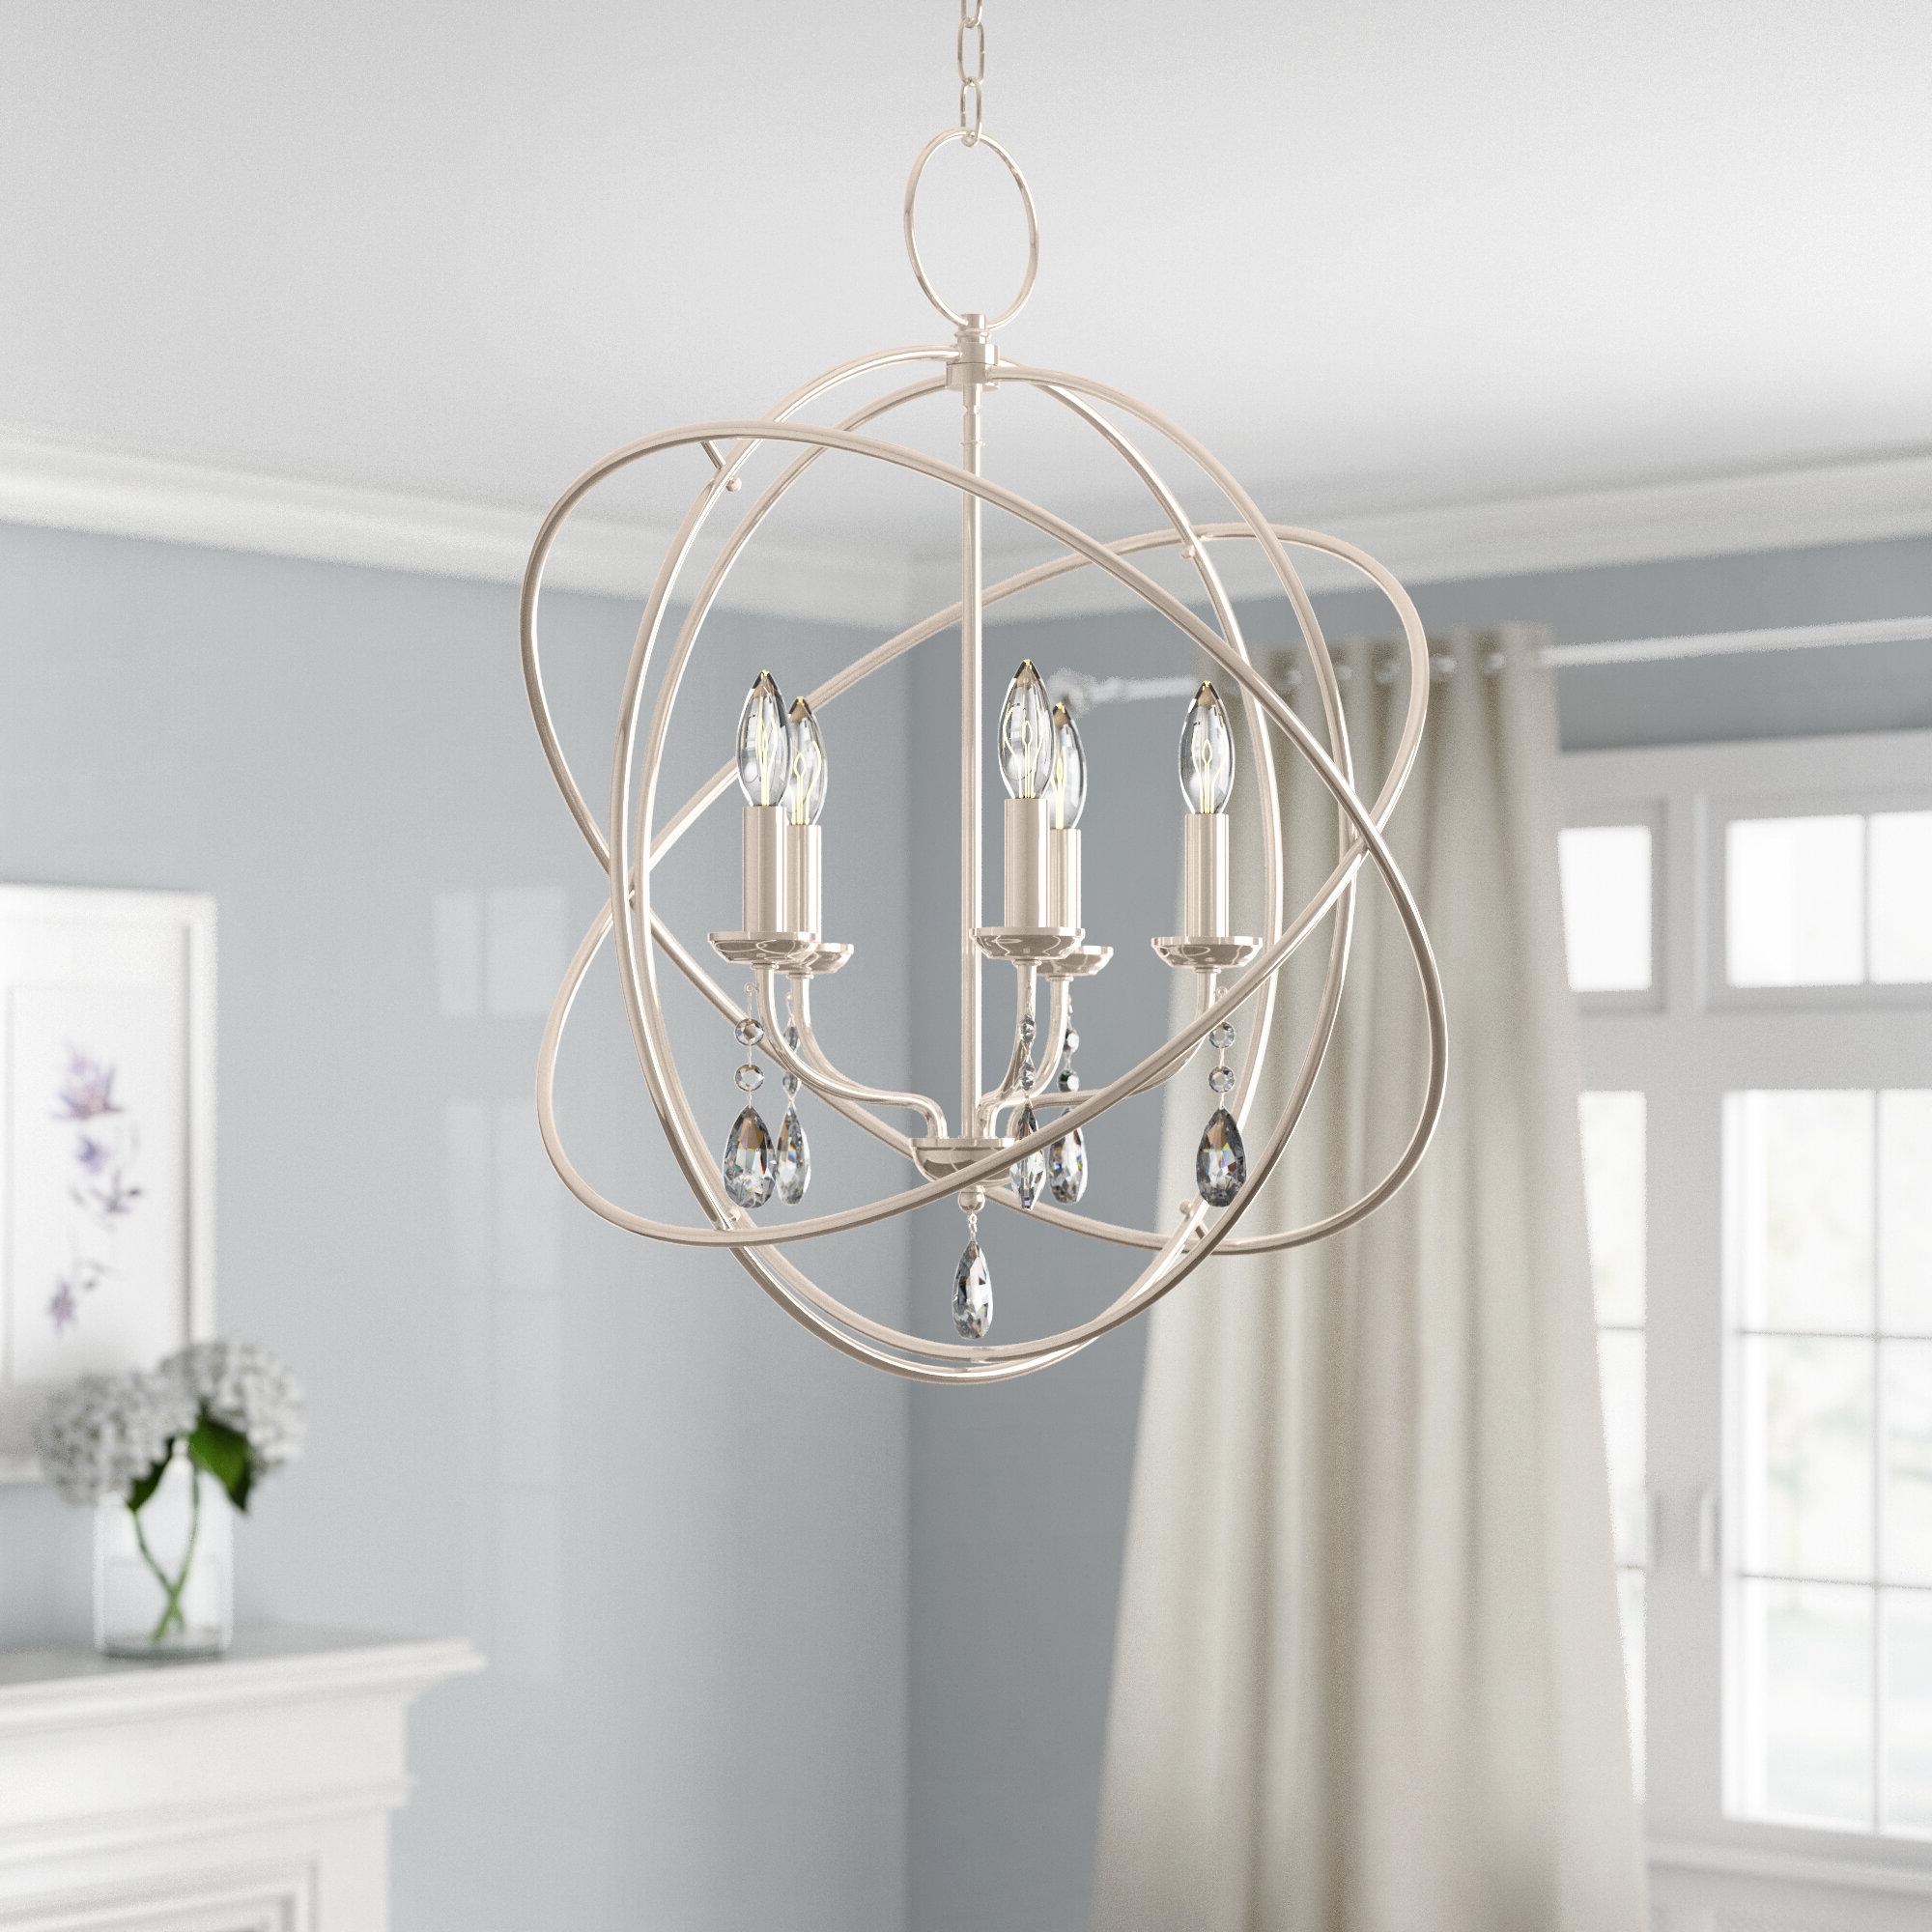 Recent Auberta 5-Light Globe Chandelier pertaining to Verlene Foyer 5-Light Globe Chandeliers